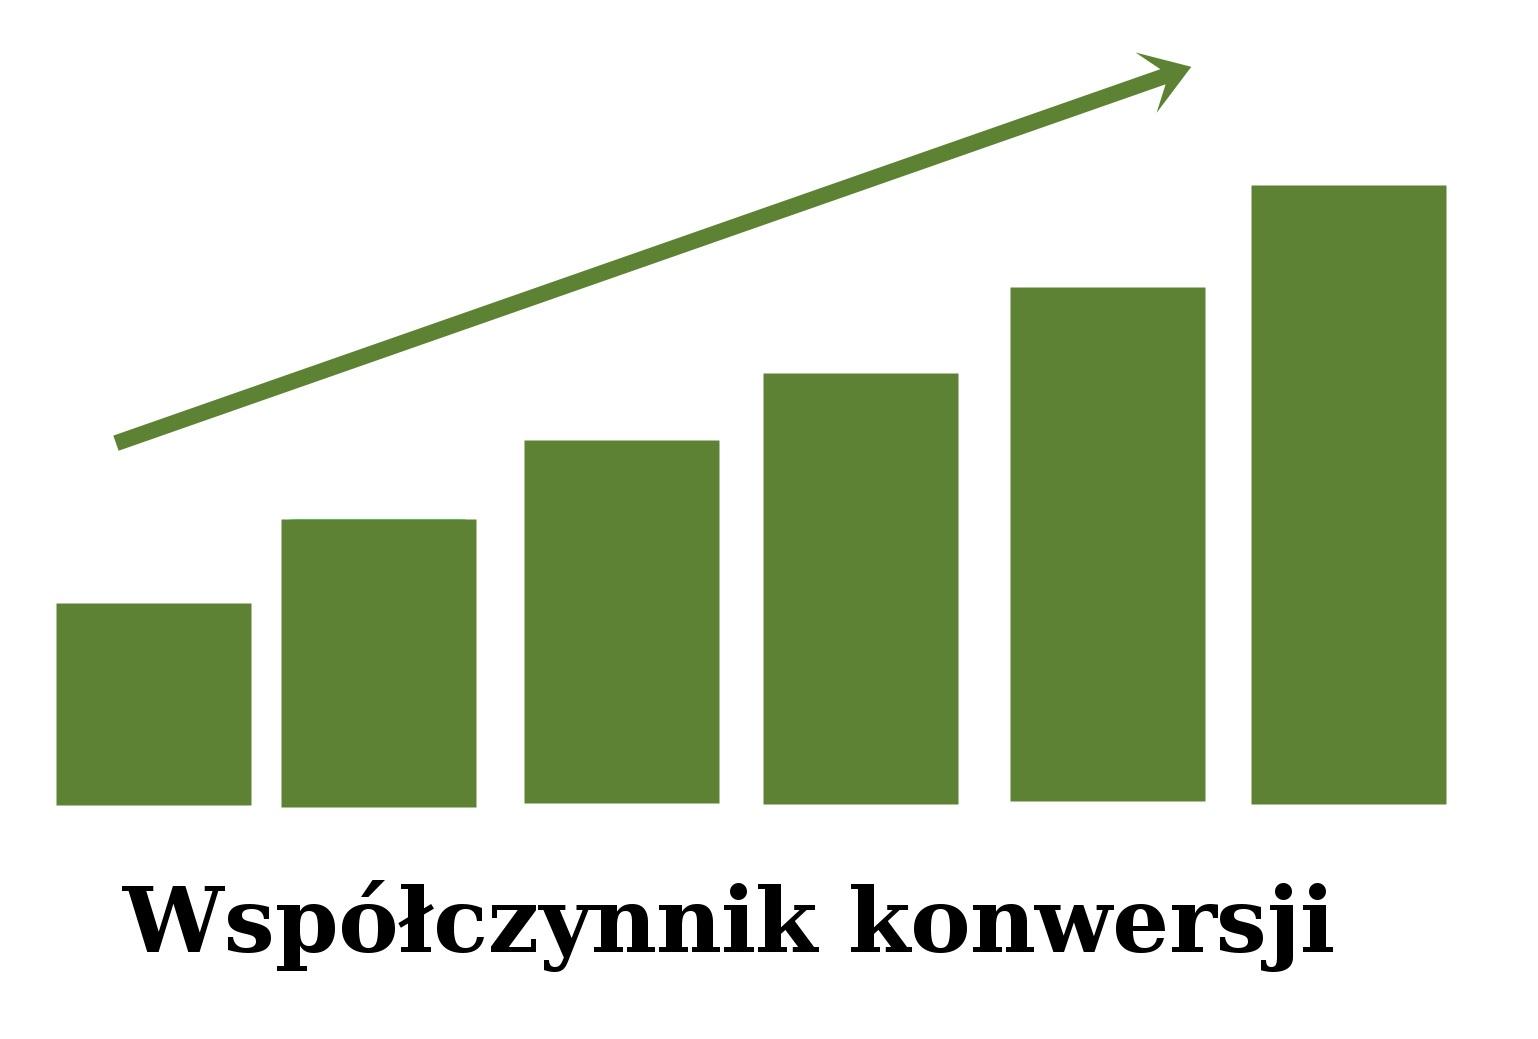 wspolczynnik-konwersji e-commerce